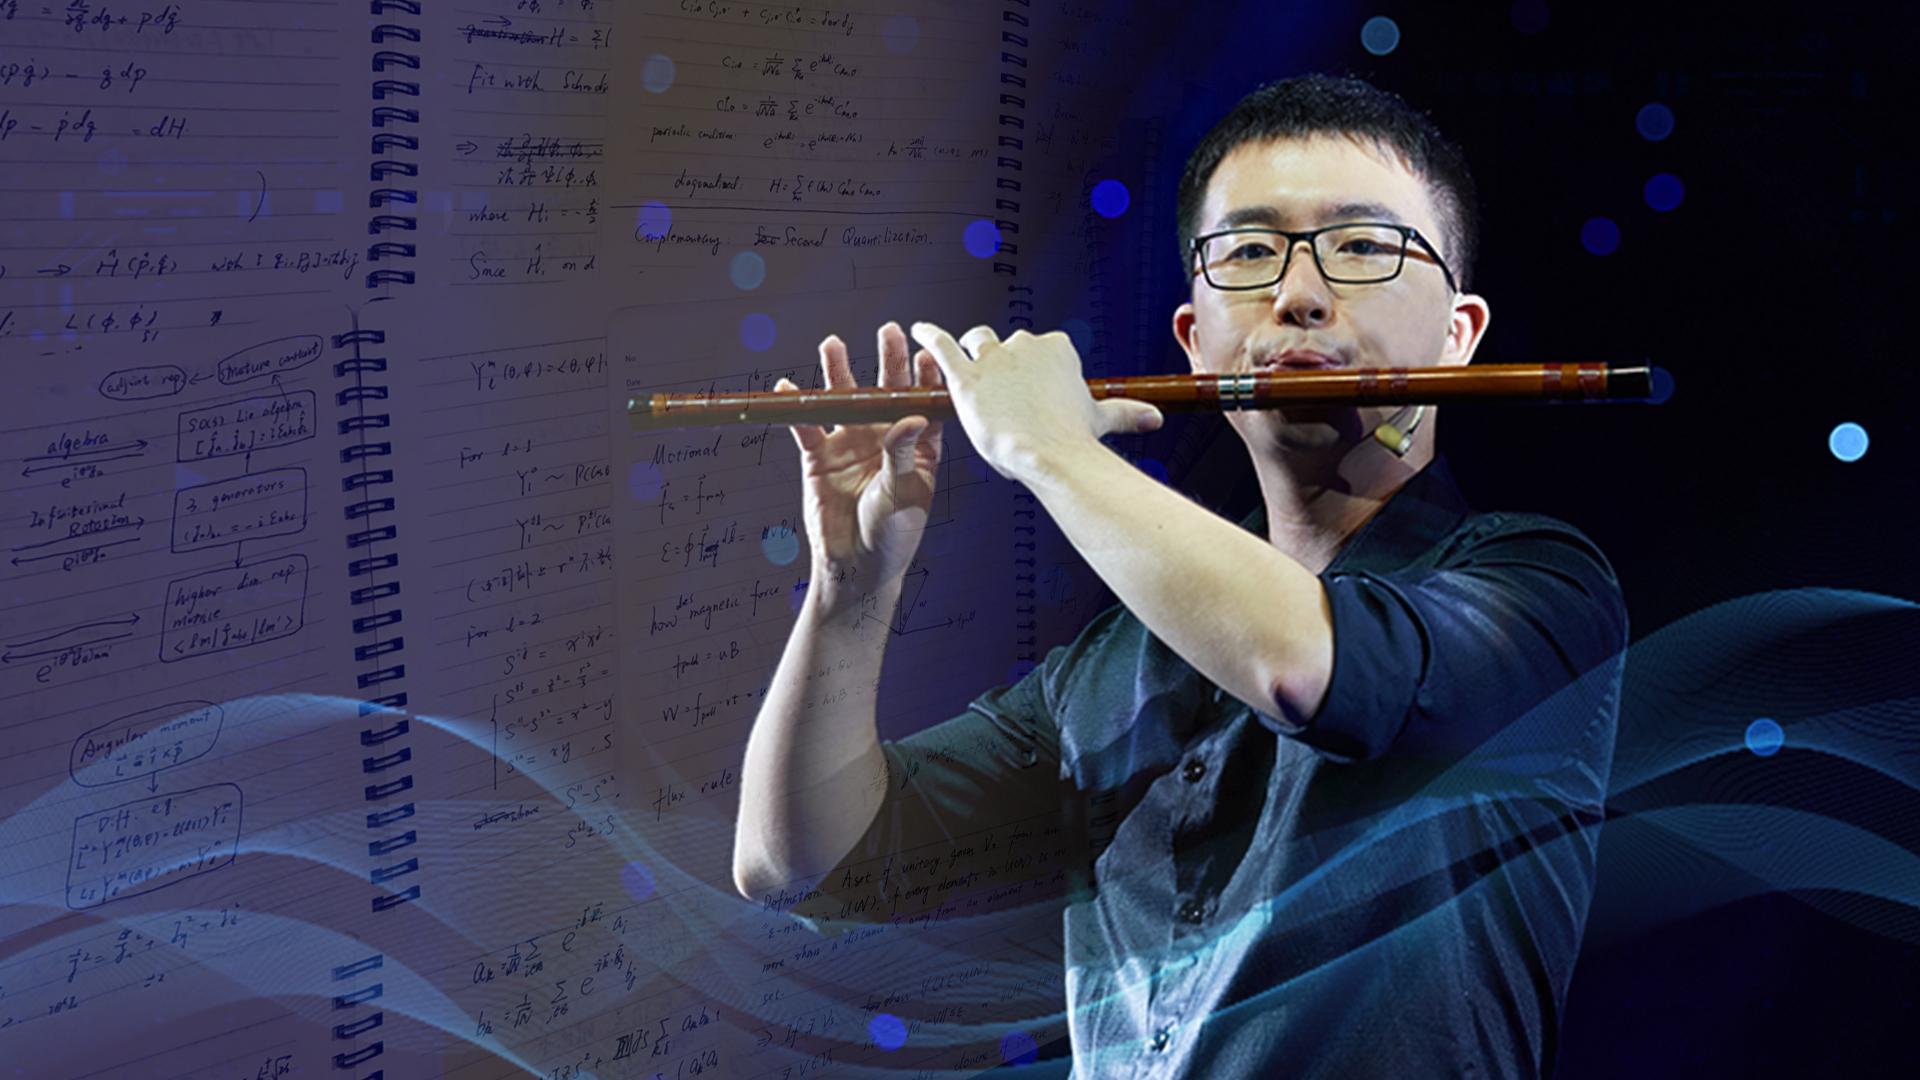 Zheng Huiyuan | A Chinese folk music flutist who loves theoretical physics